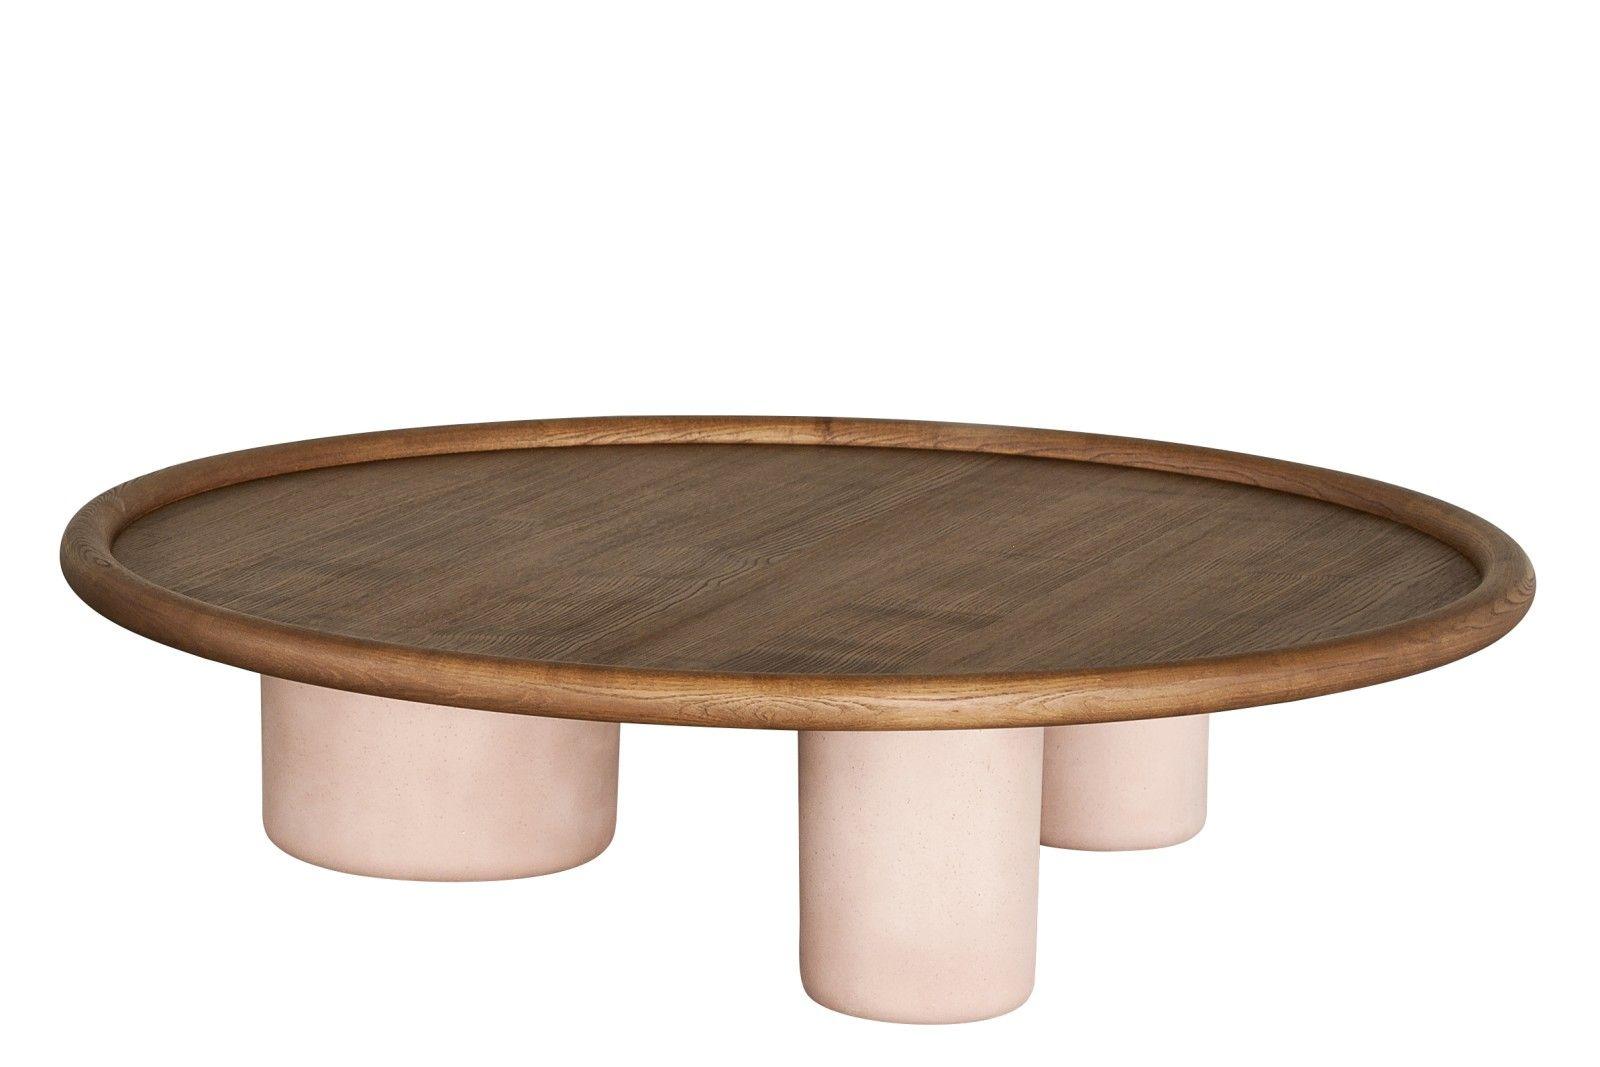 Pluto Coffee Table T115 Walnut Solid Wood Table Table Solid Wood Table Tops [ 1067 x 1600 Pixel ]